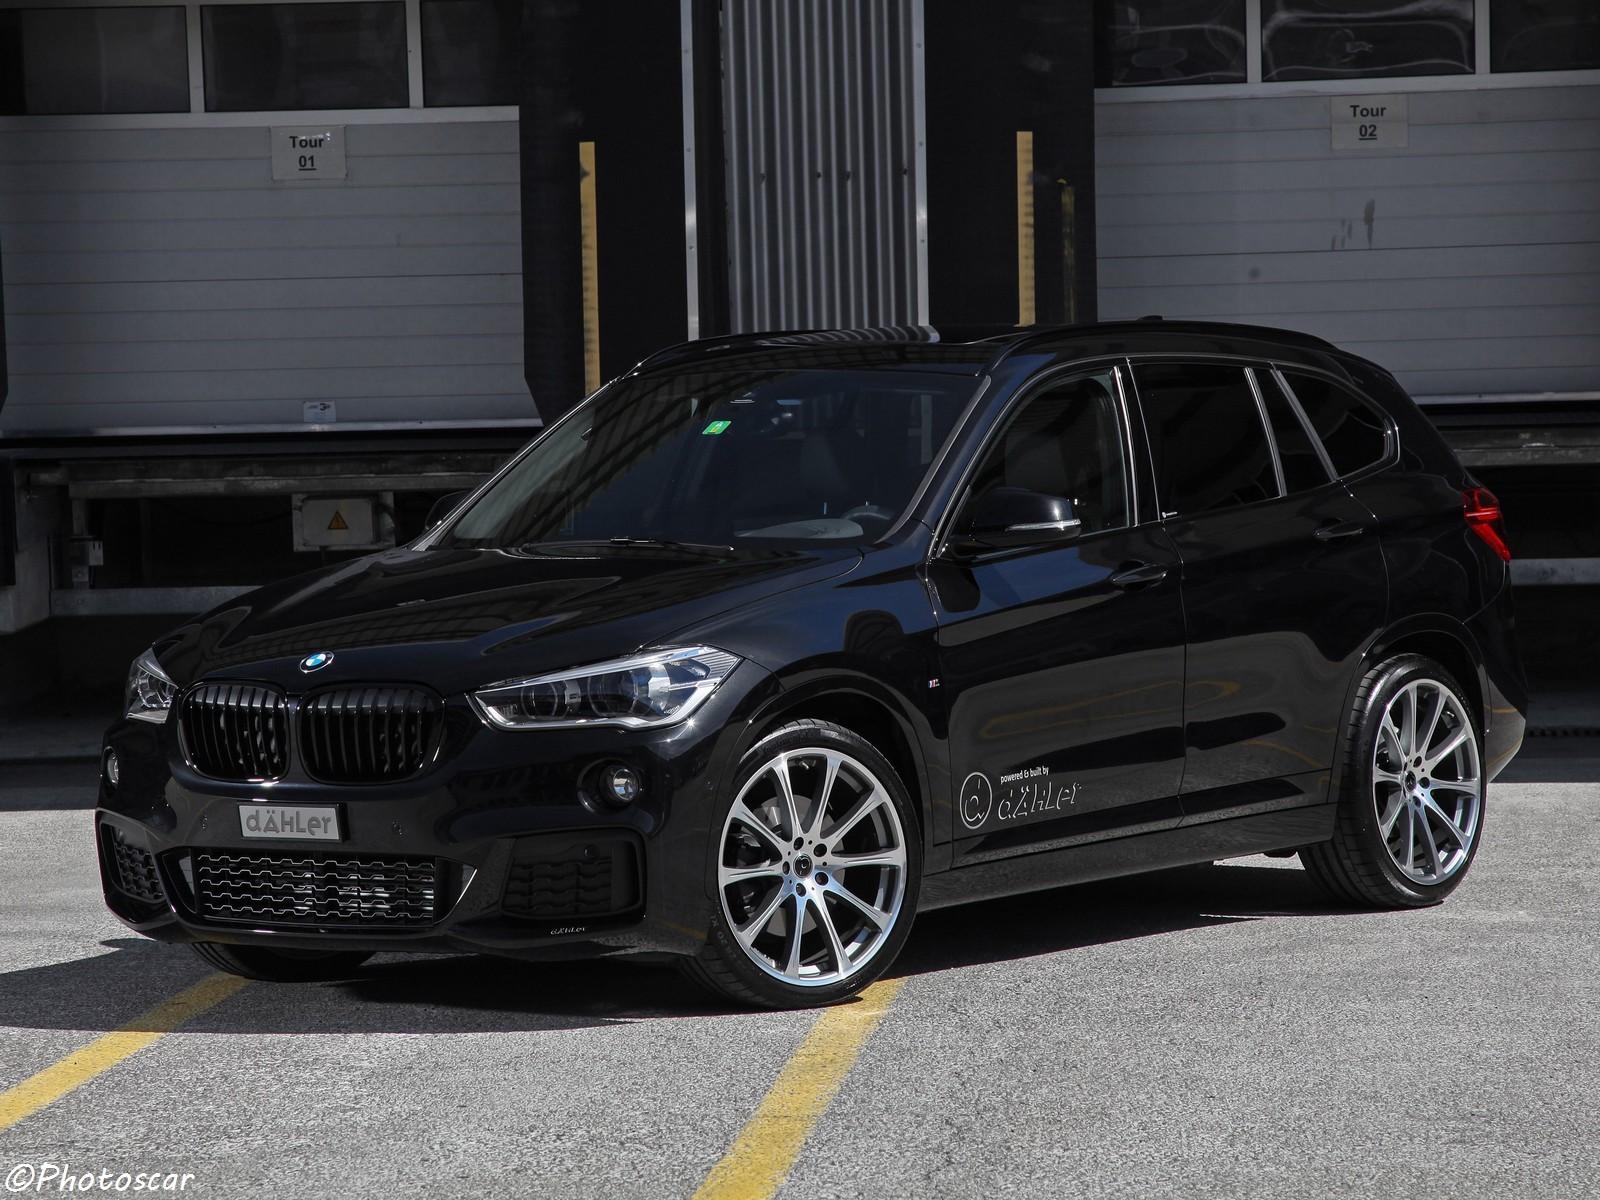 Dahler BMW X1 2018